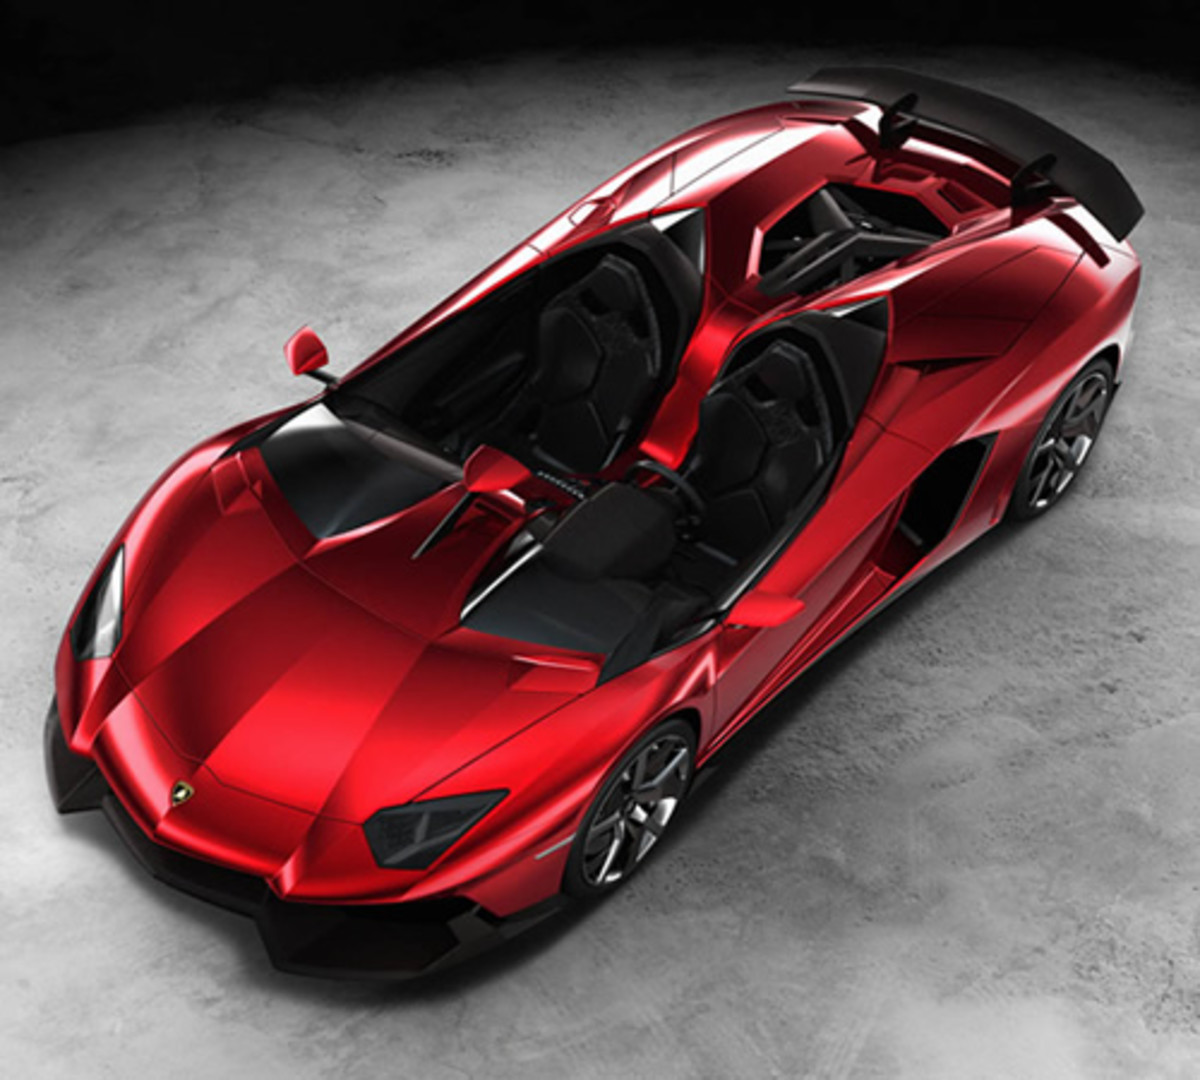 Cars Lamborghini: Lamborghini Aventador J Roadster